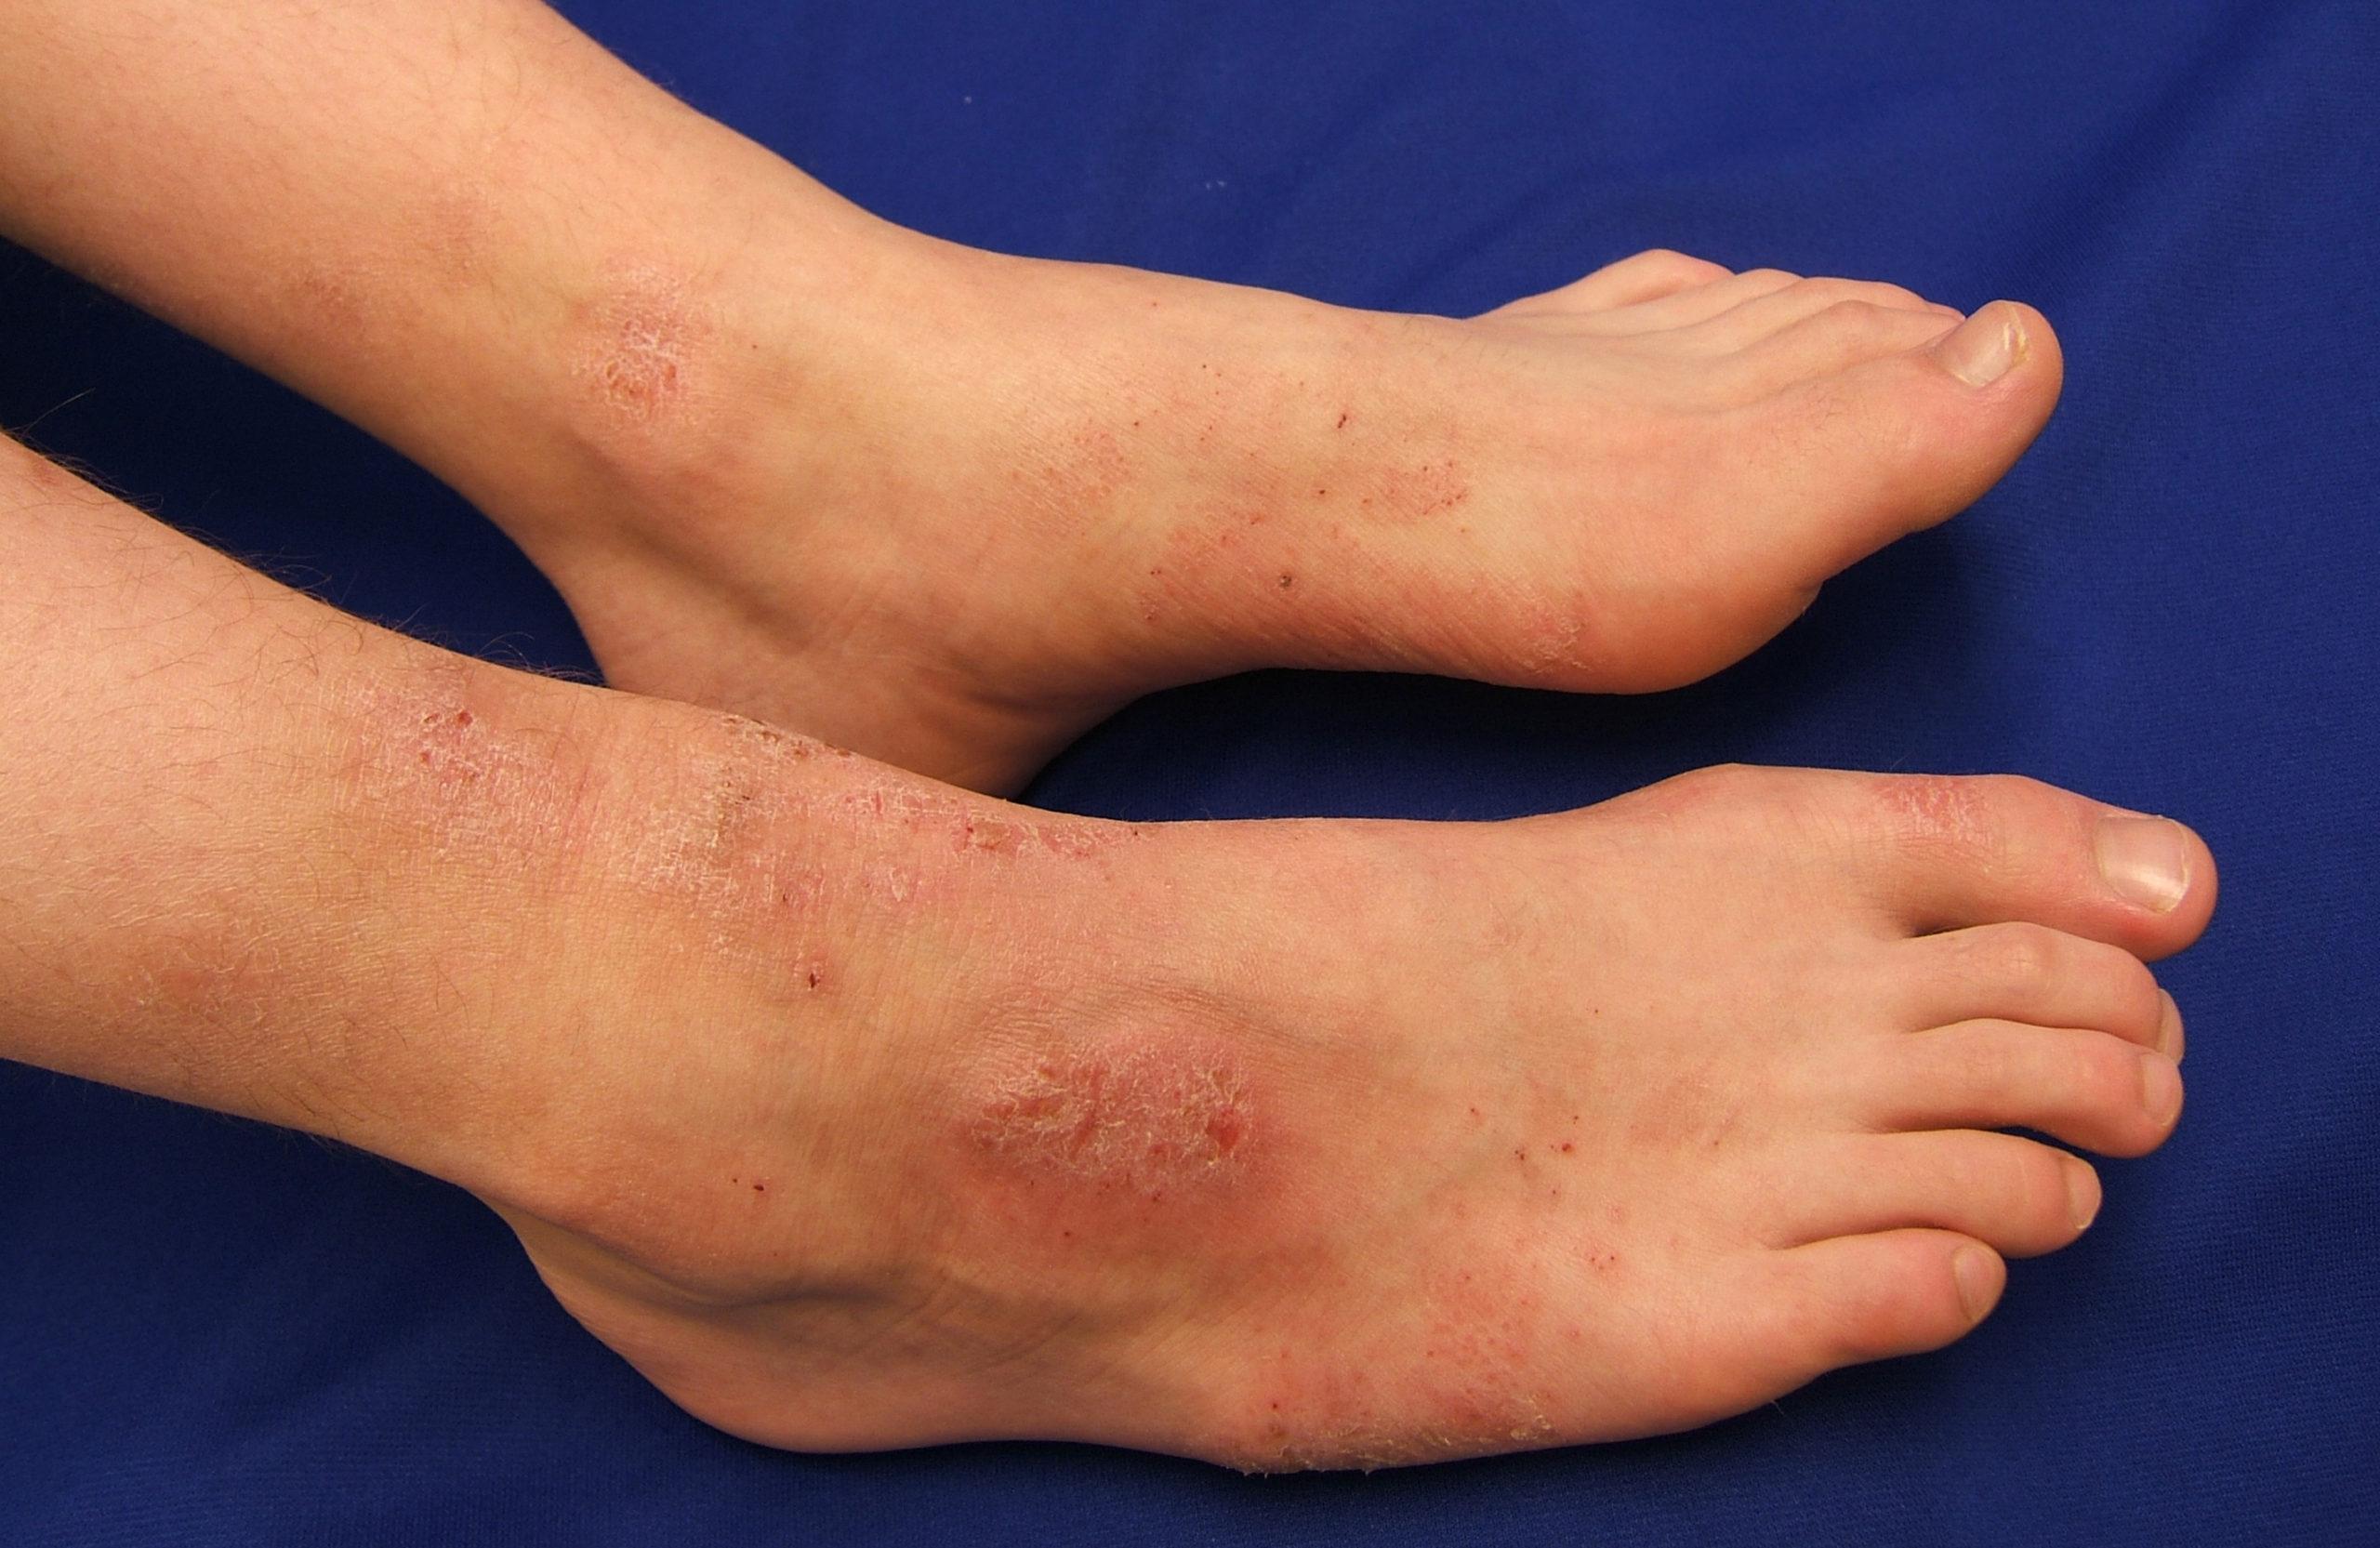 Diabetic foot irritation treatment in Tamil